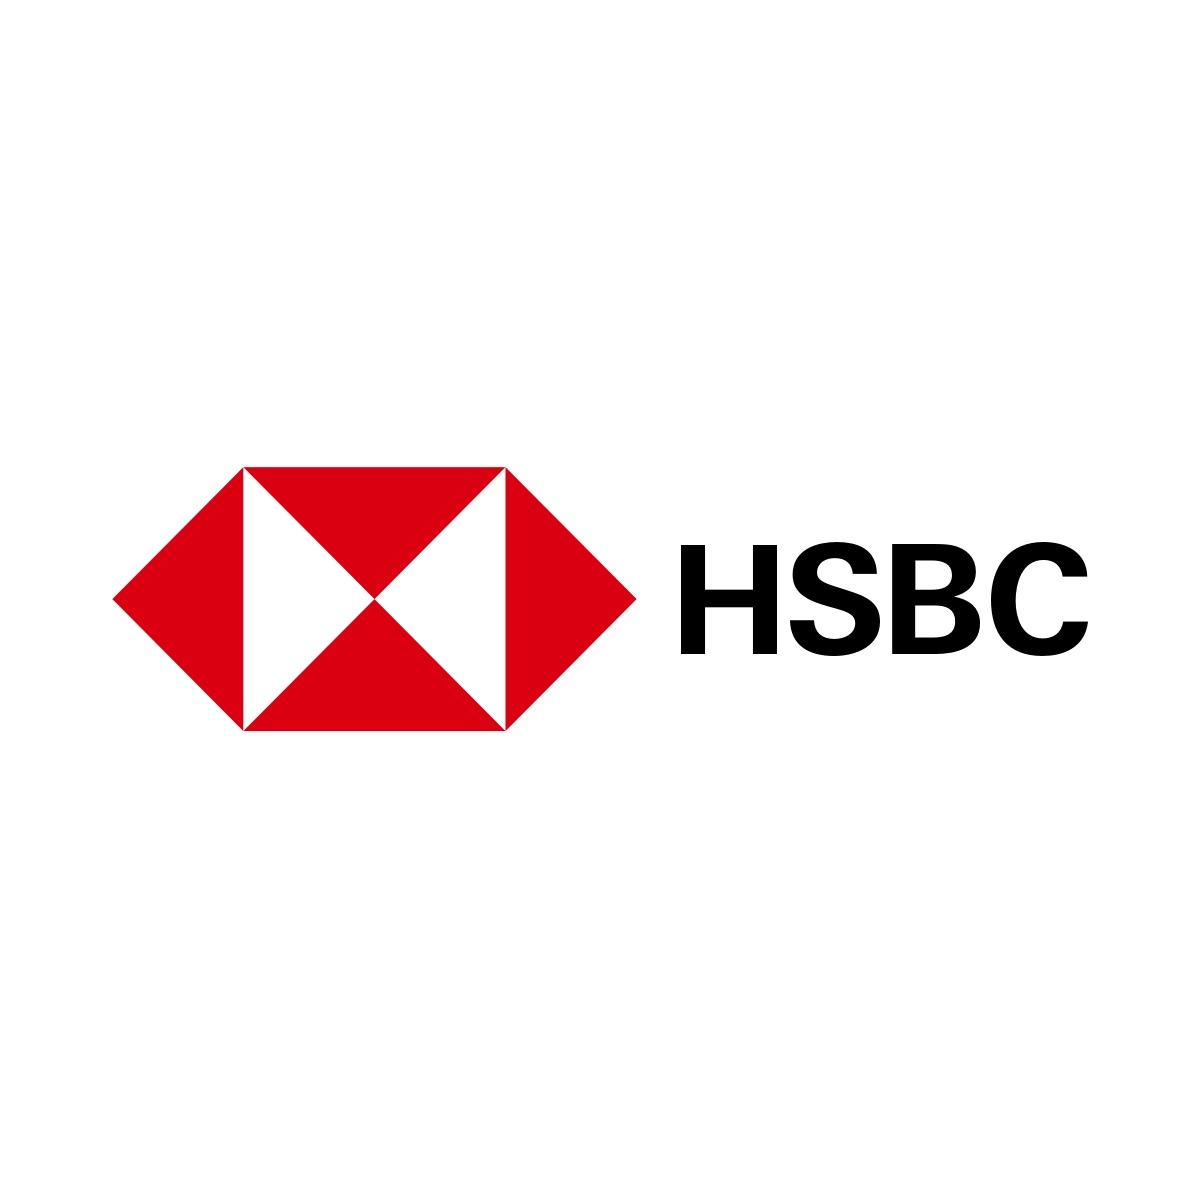 www.hsbc.com.sg